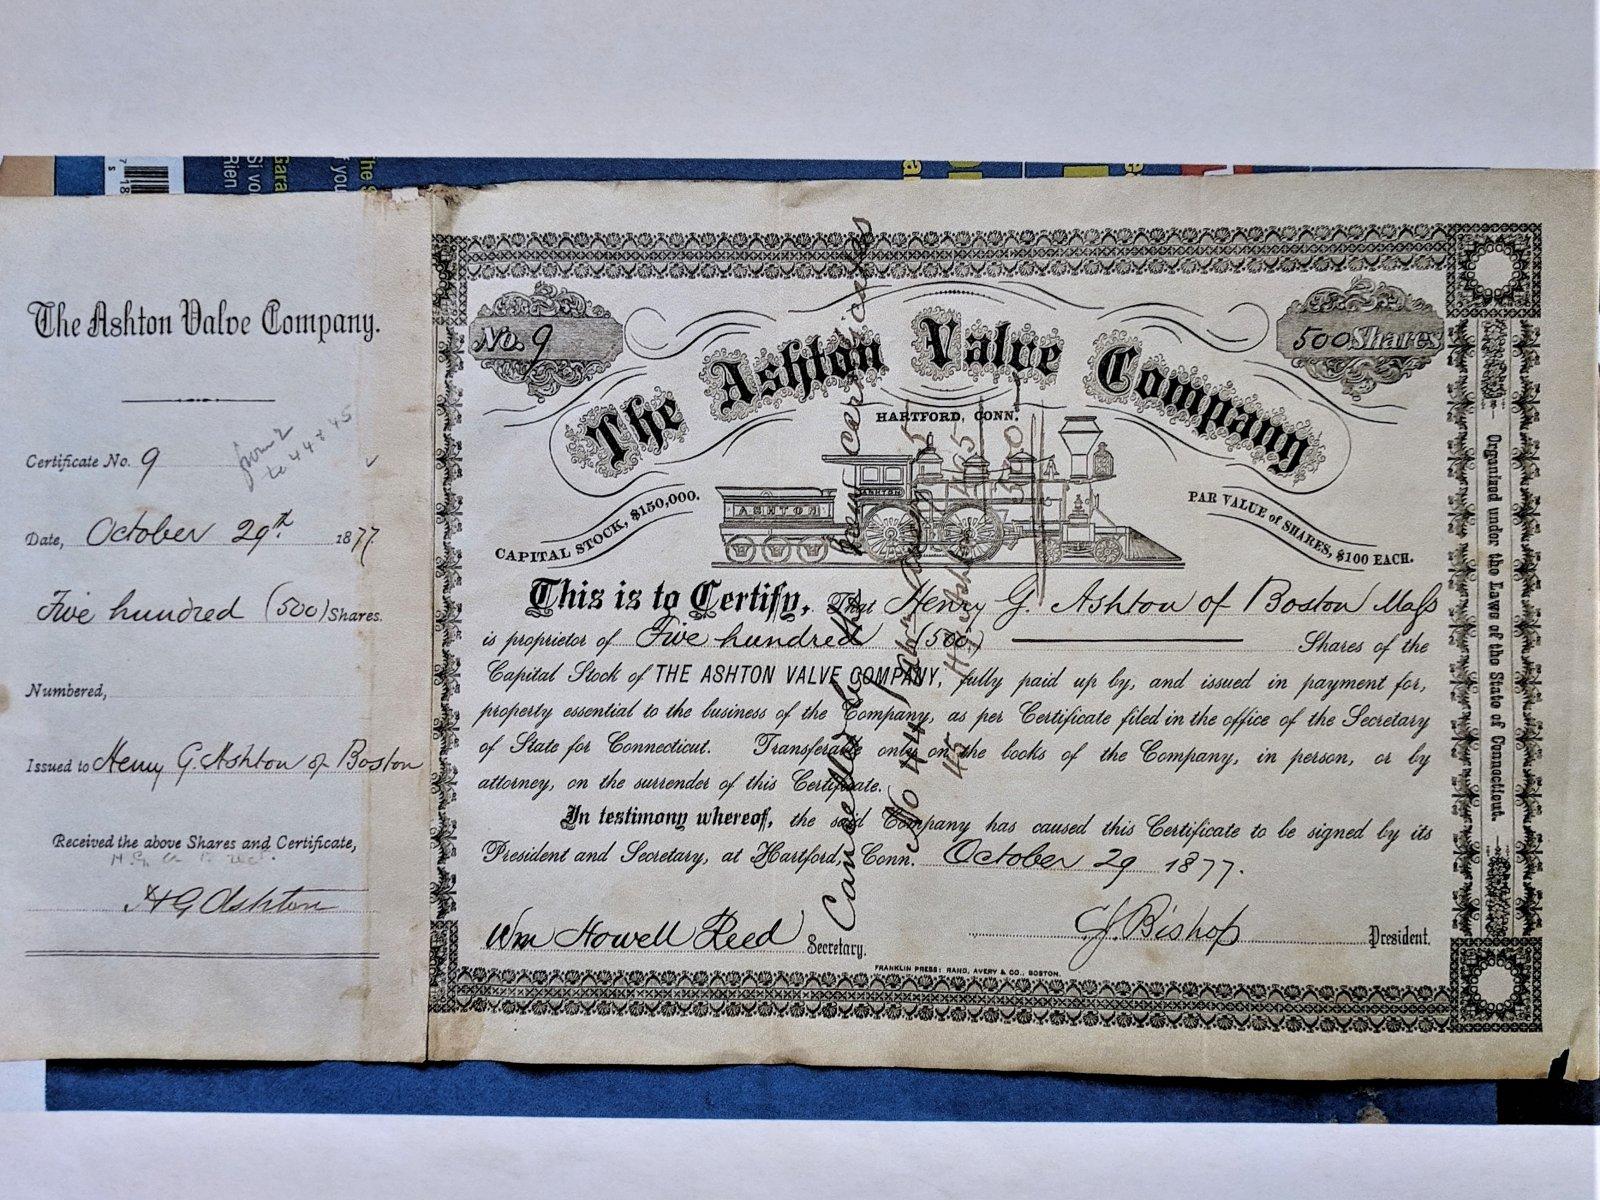 1877 STOCK CERTIFICATE.jpg